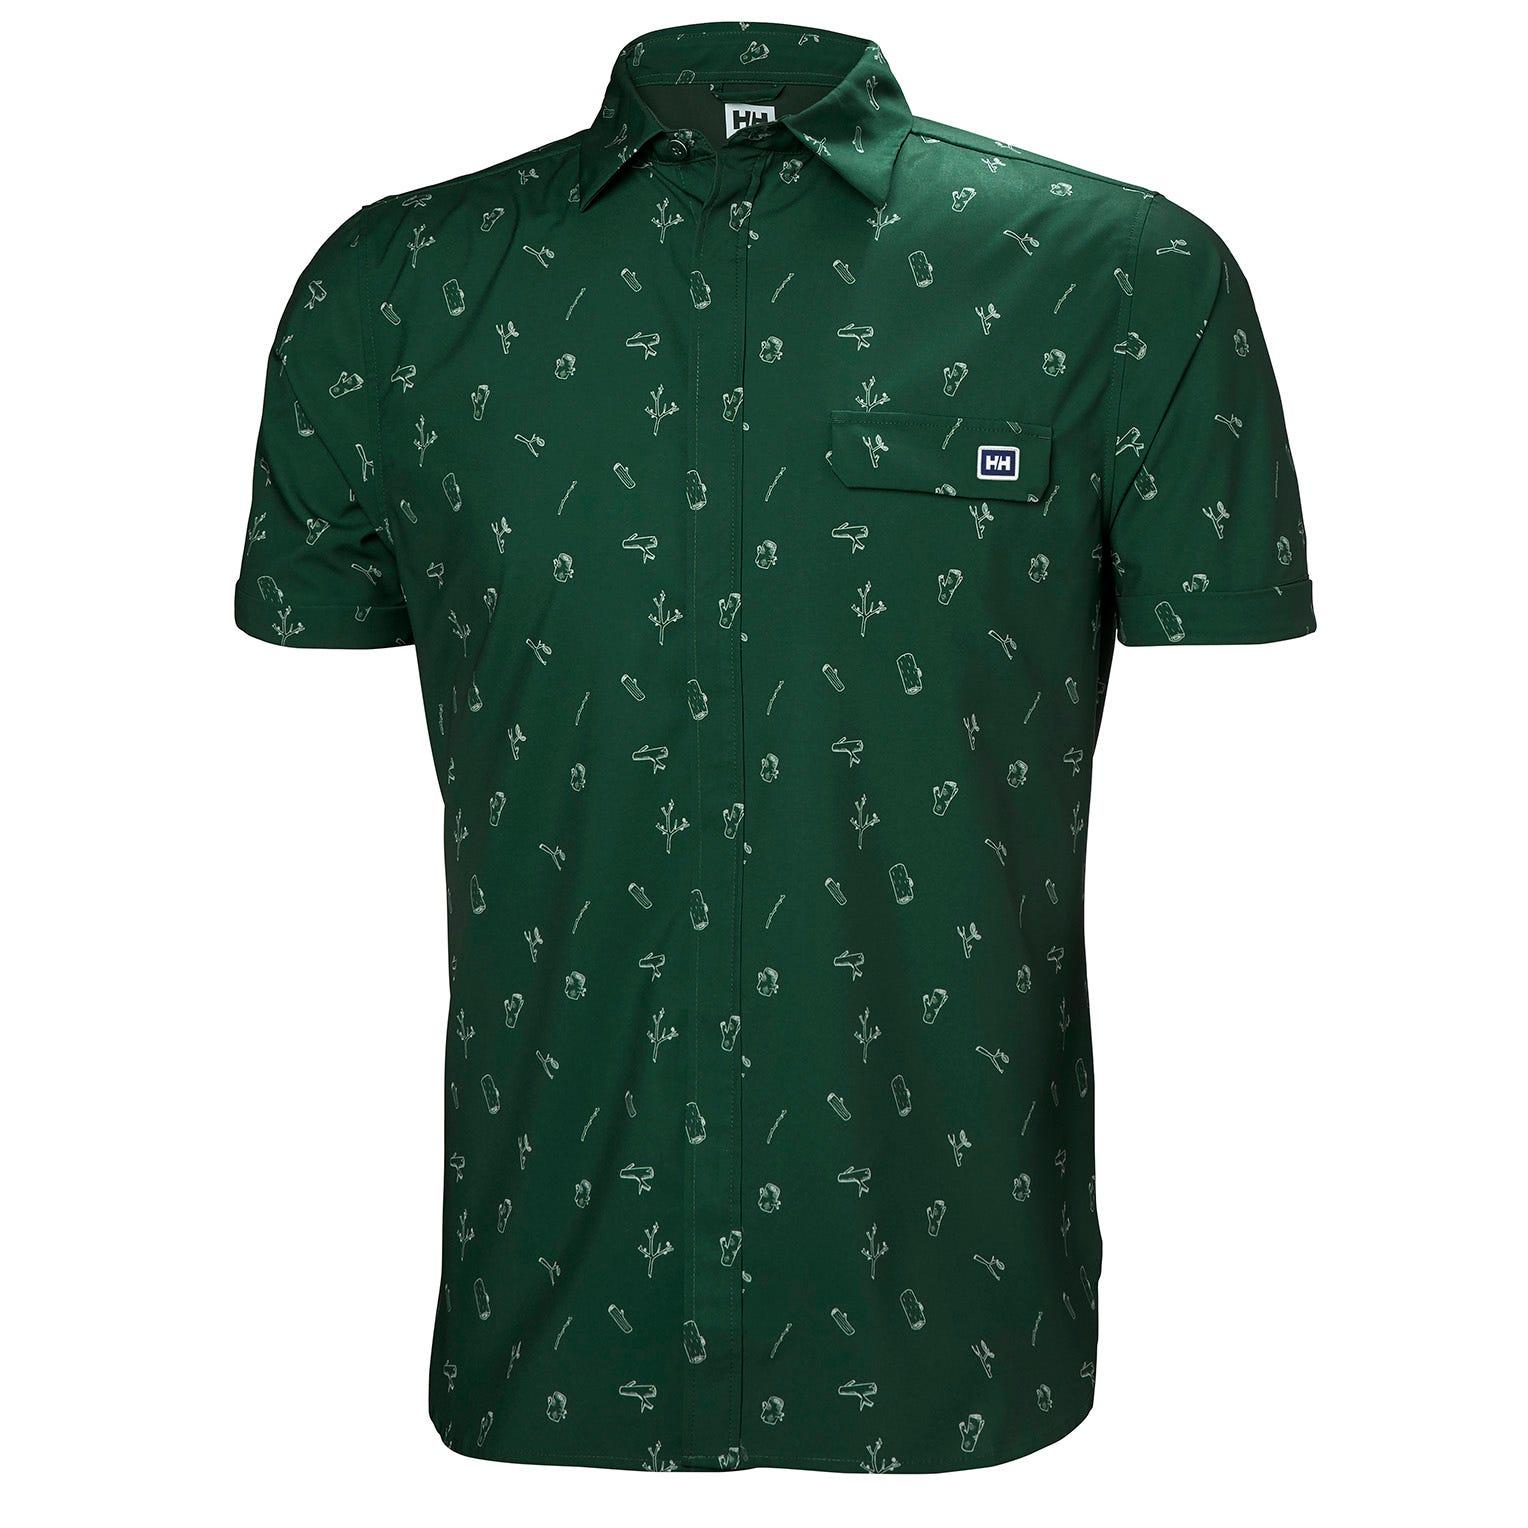 Helly Hansen Oya Shirt Green S